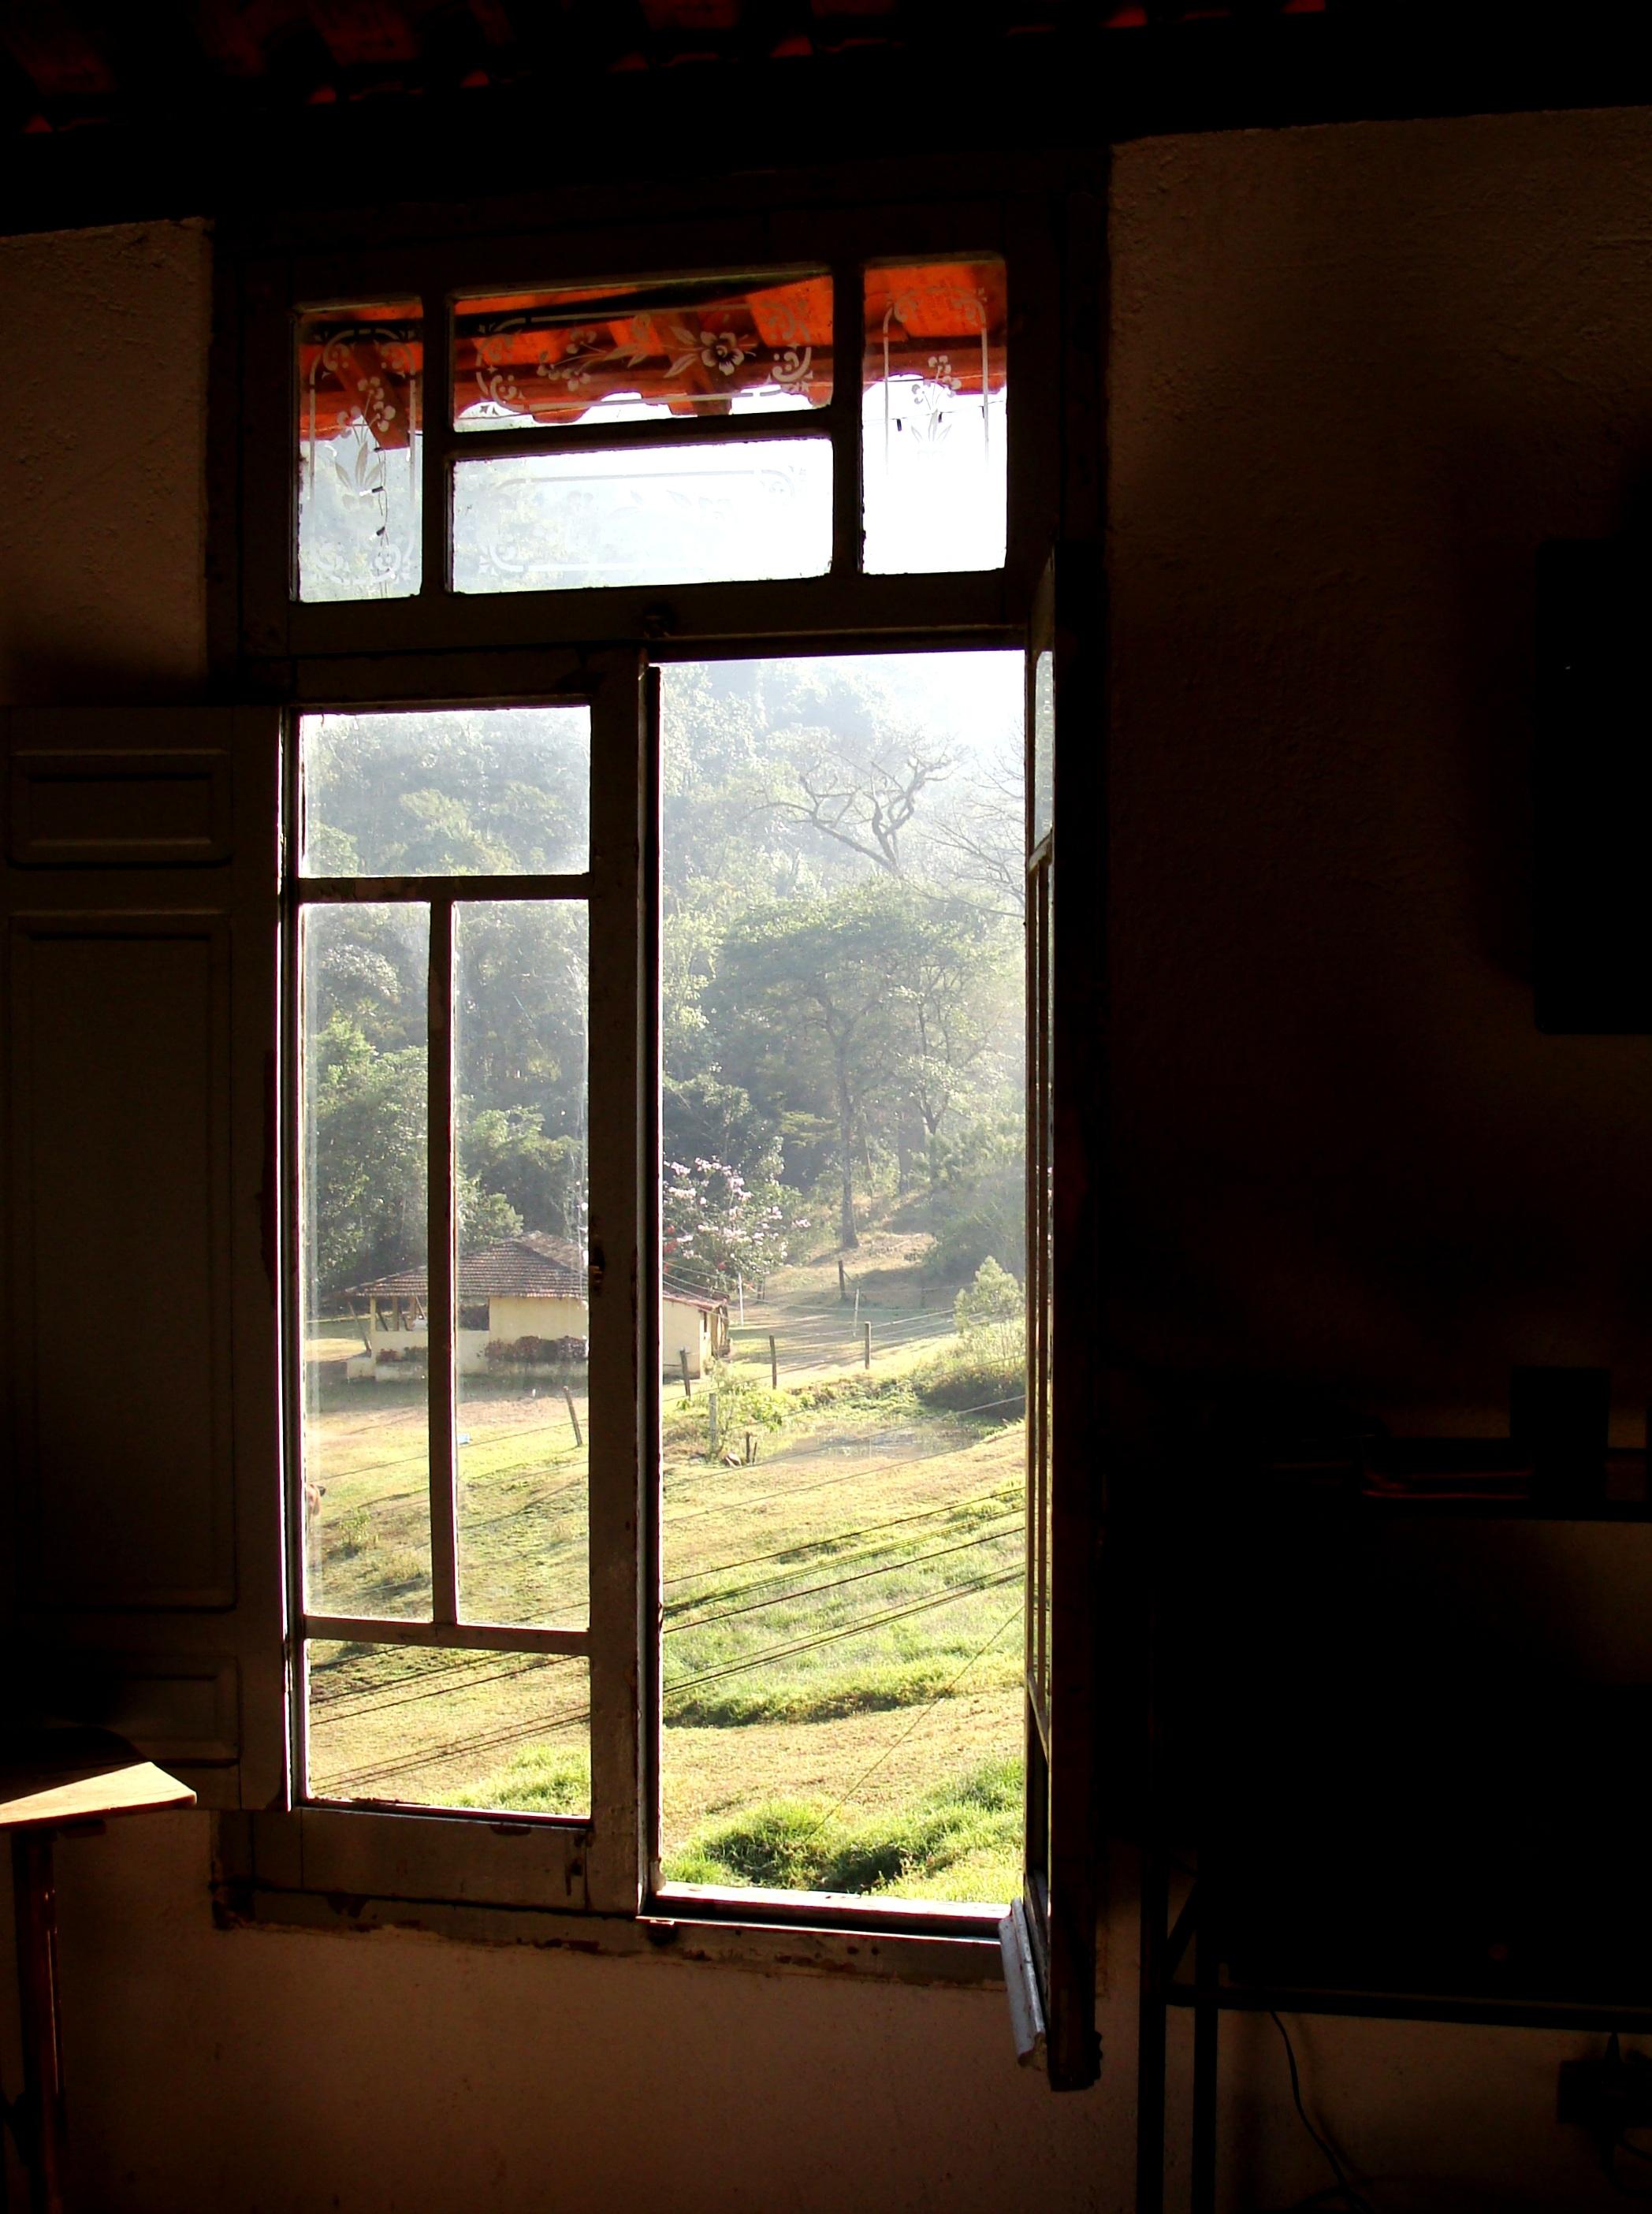 Fotos gratis : ligero, madera, granja, casa, color, marco, paz, sala ...